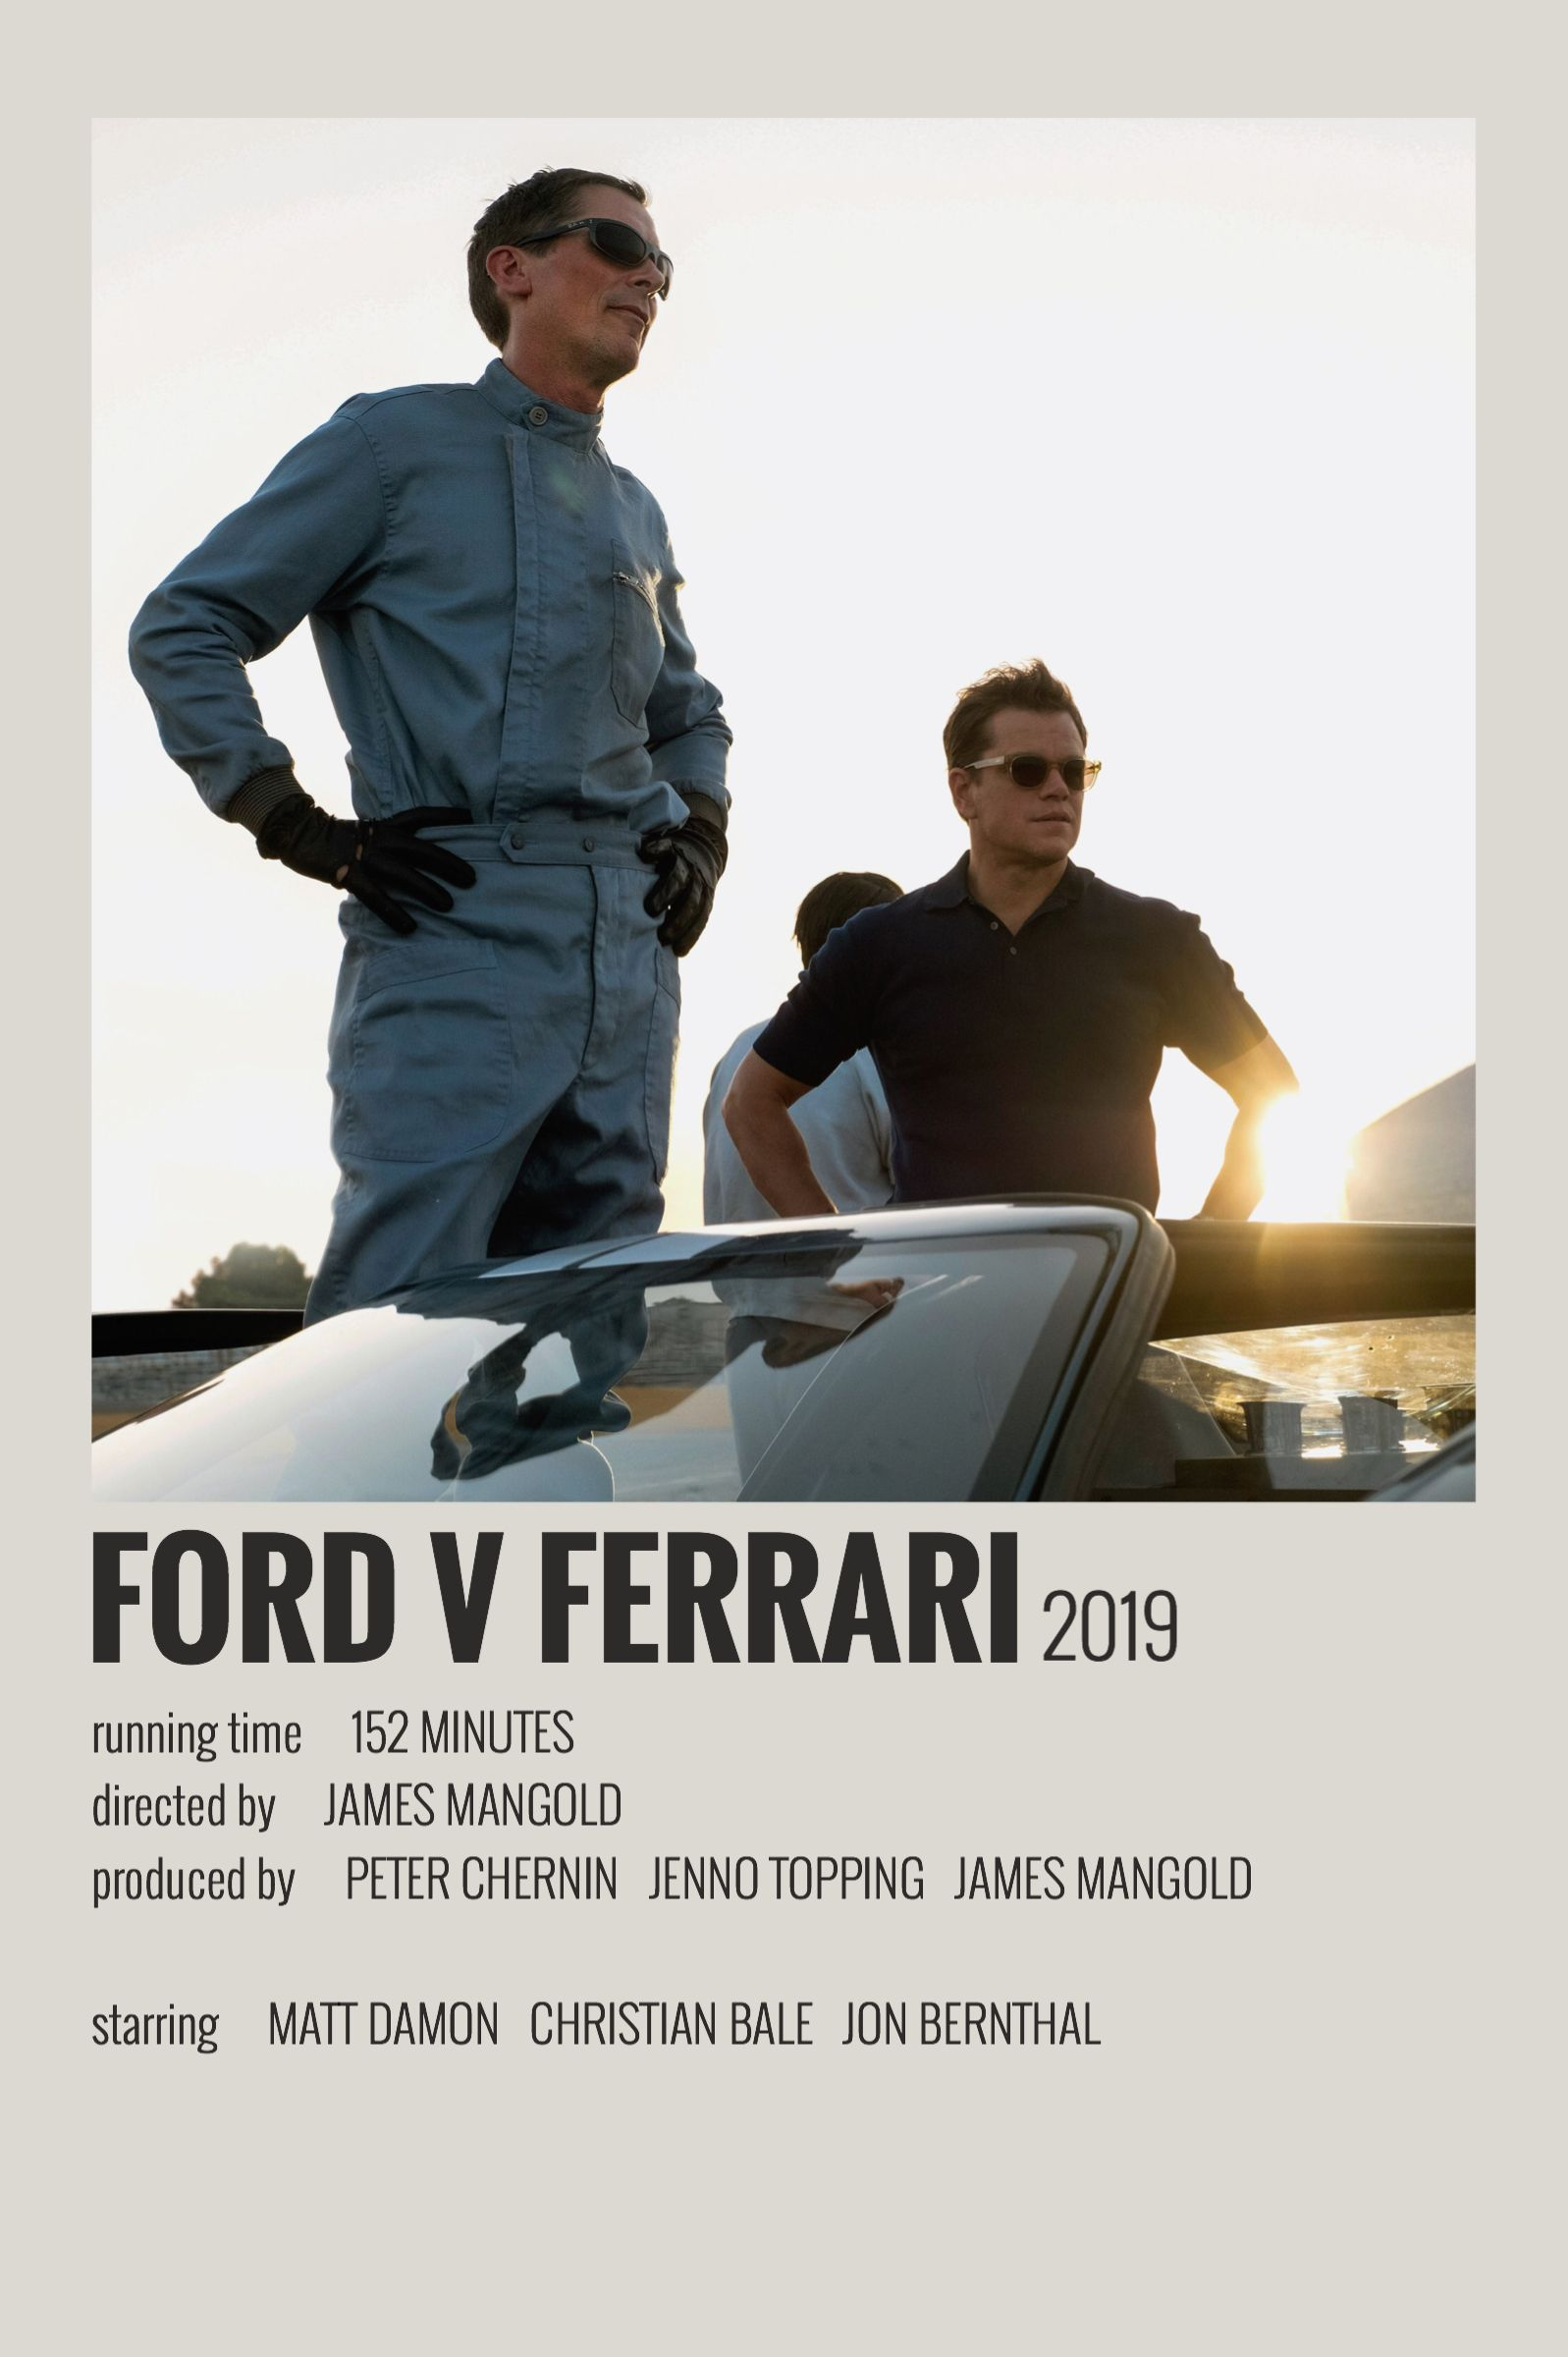 Ford V Ferrari Polaroid Poster Movie Posters Minimalist Movie Poster Wall Film Posters Minimalist